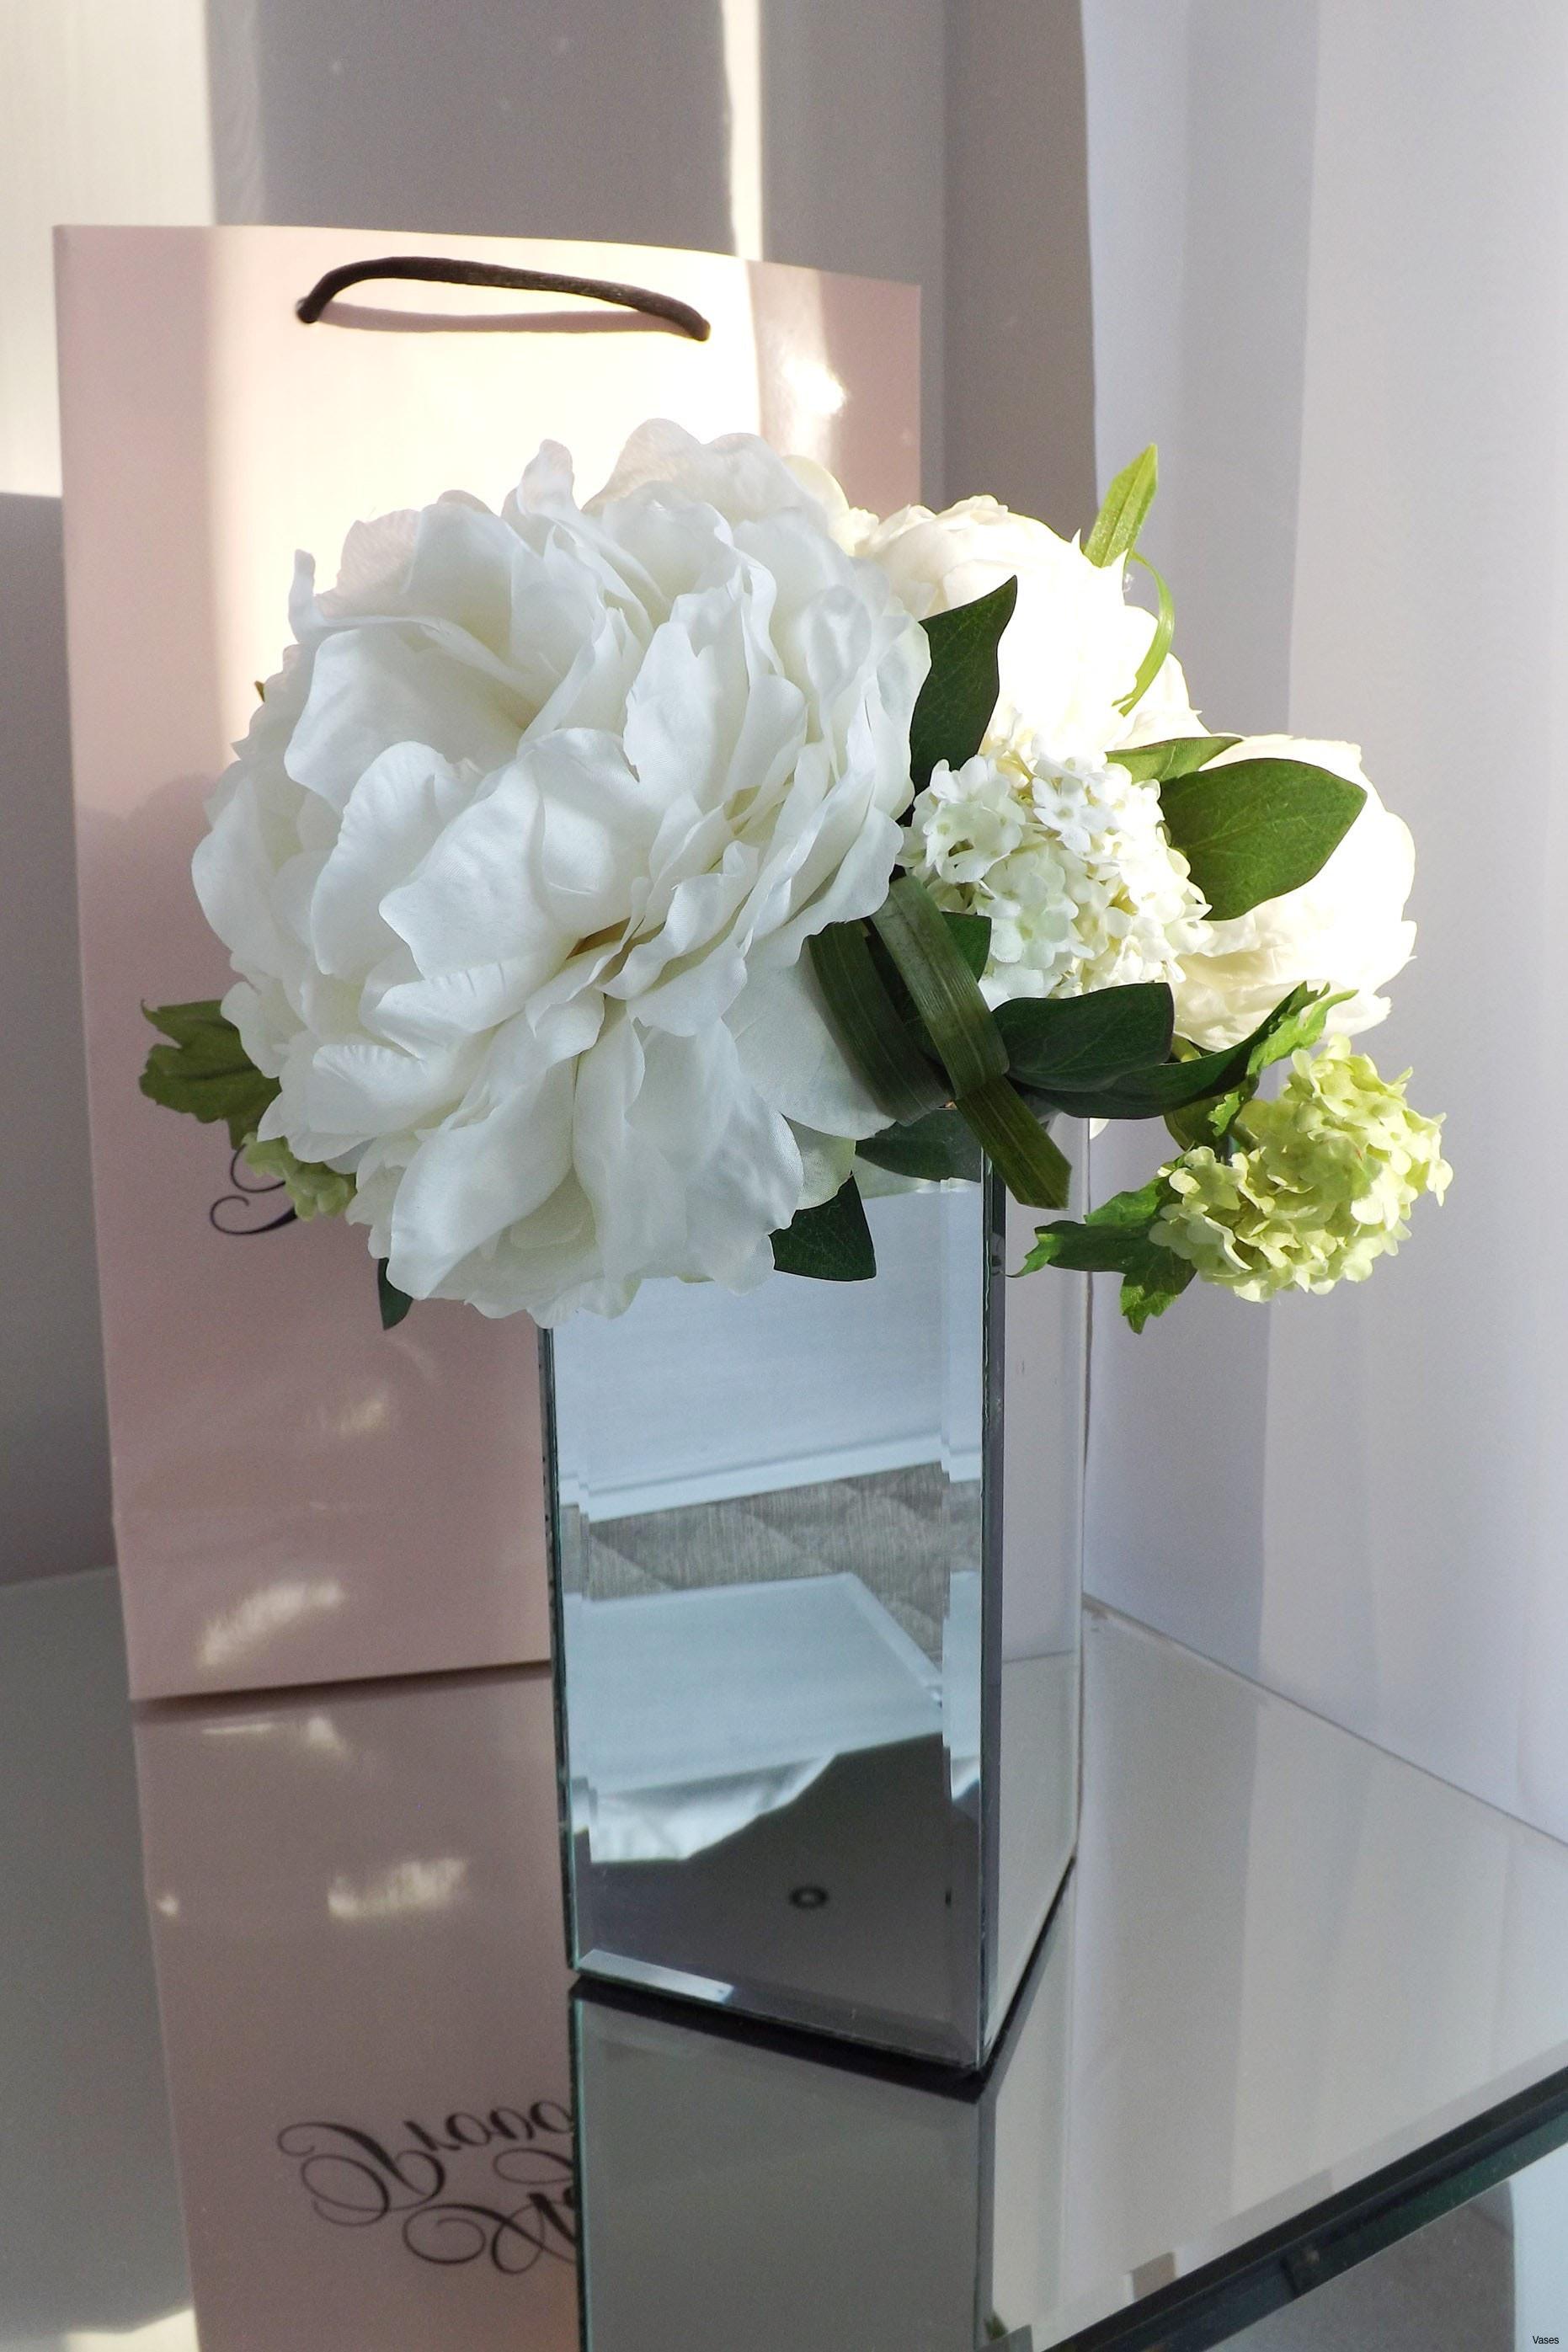 Metal Vases 3h Mirrored Mosaic Vase Votivei 0d Hobby Lobby Canada to Design Ideas Flower